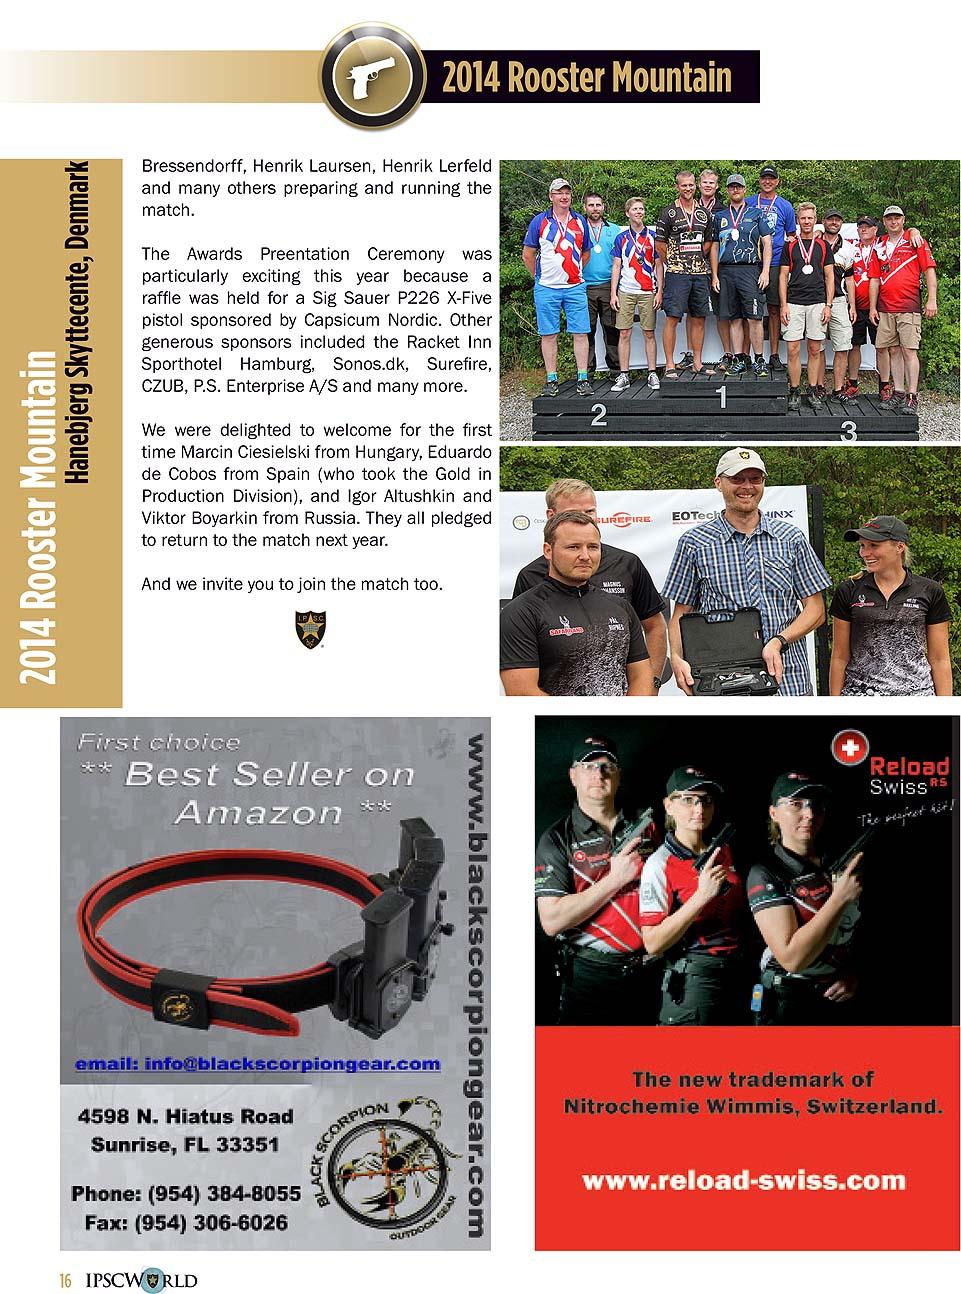 IPSC World Magazine IV-2014-S. 16.jpg